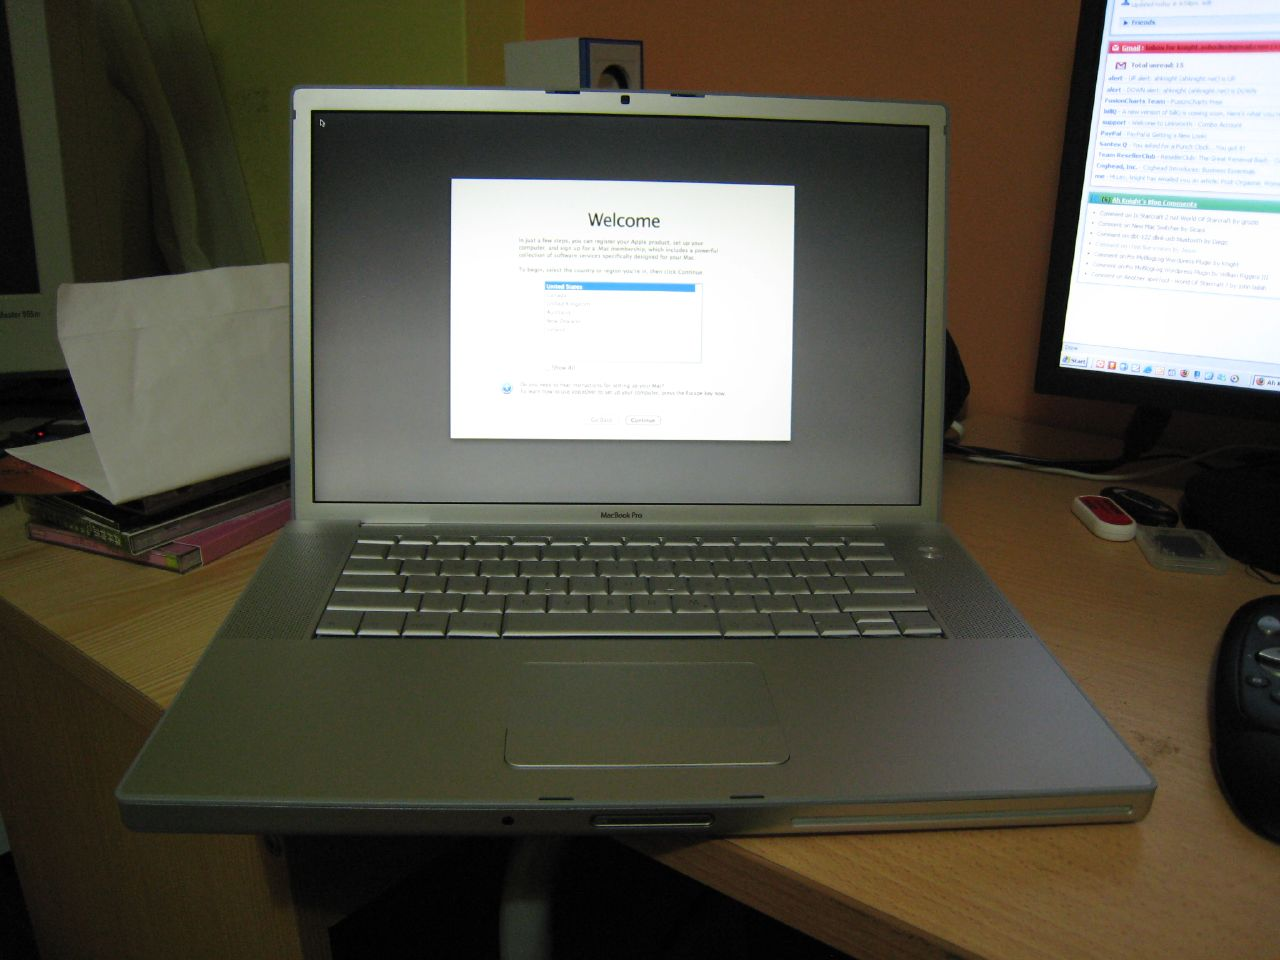 macbook pro kick start